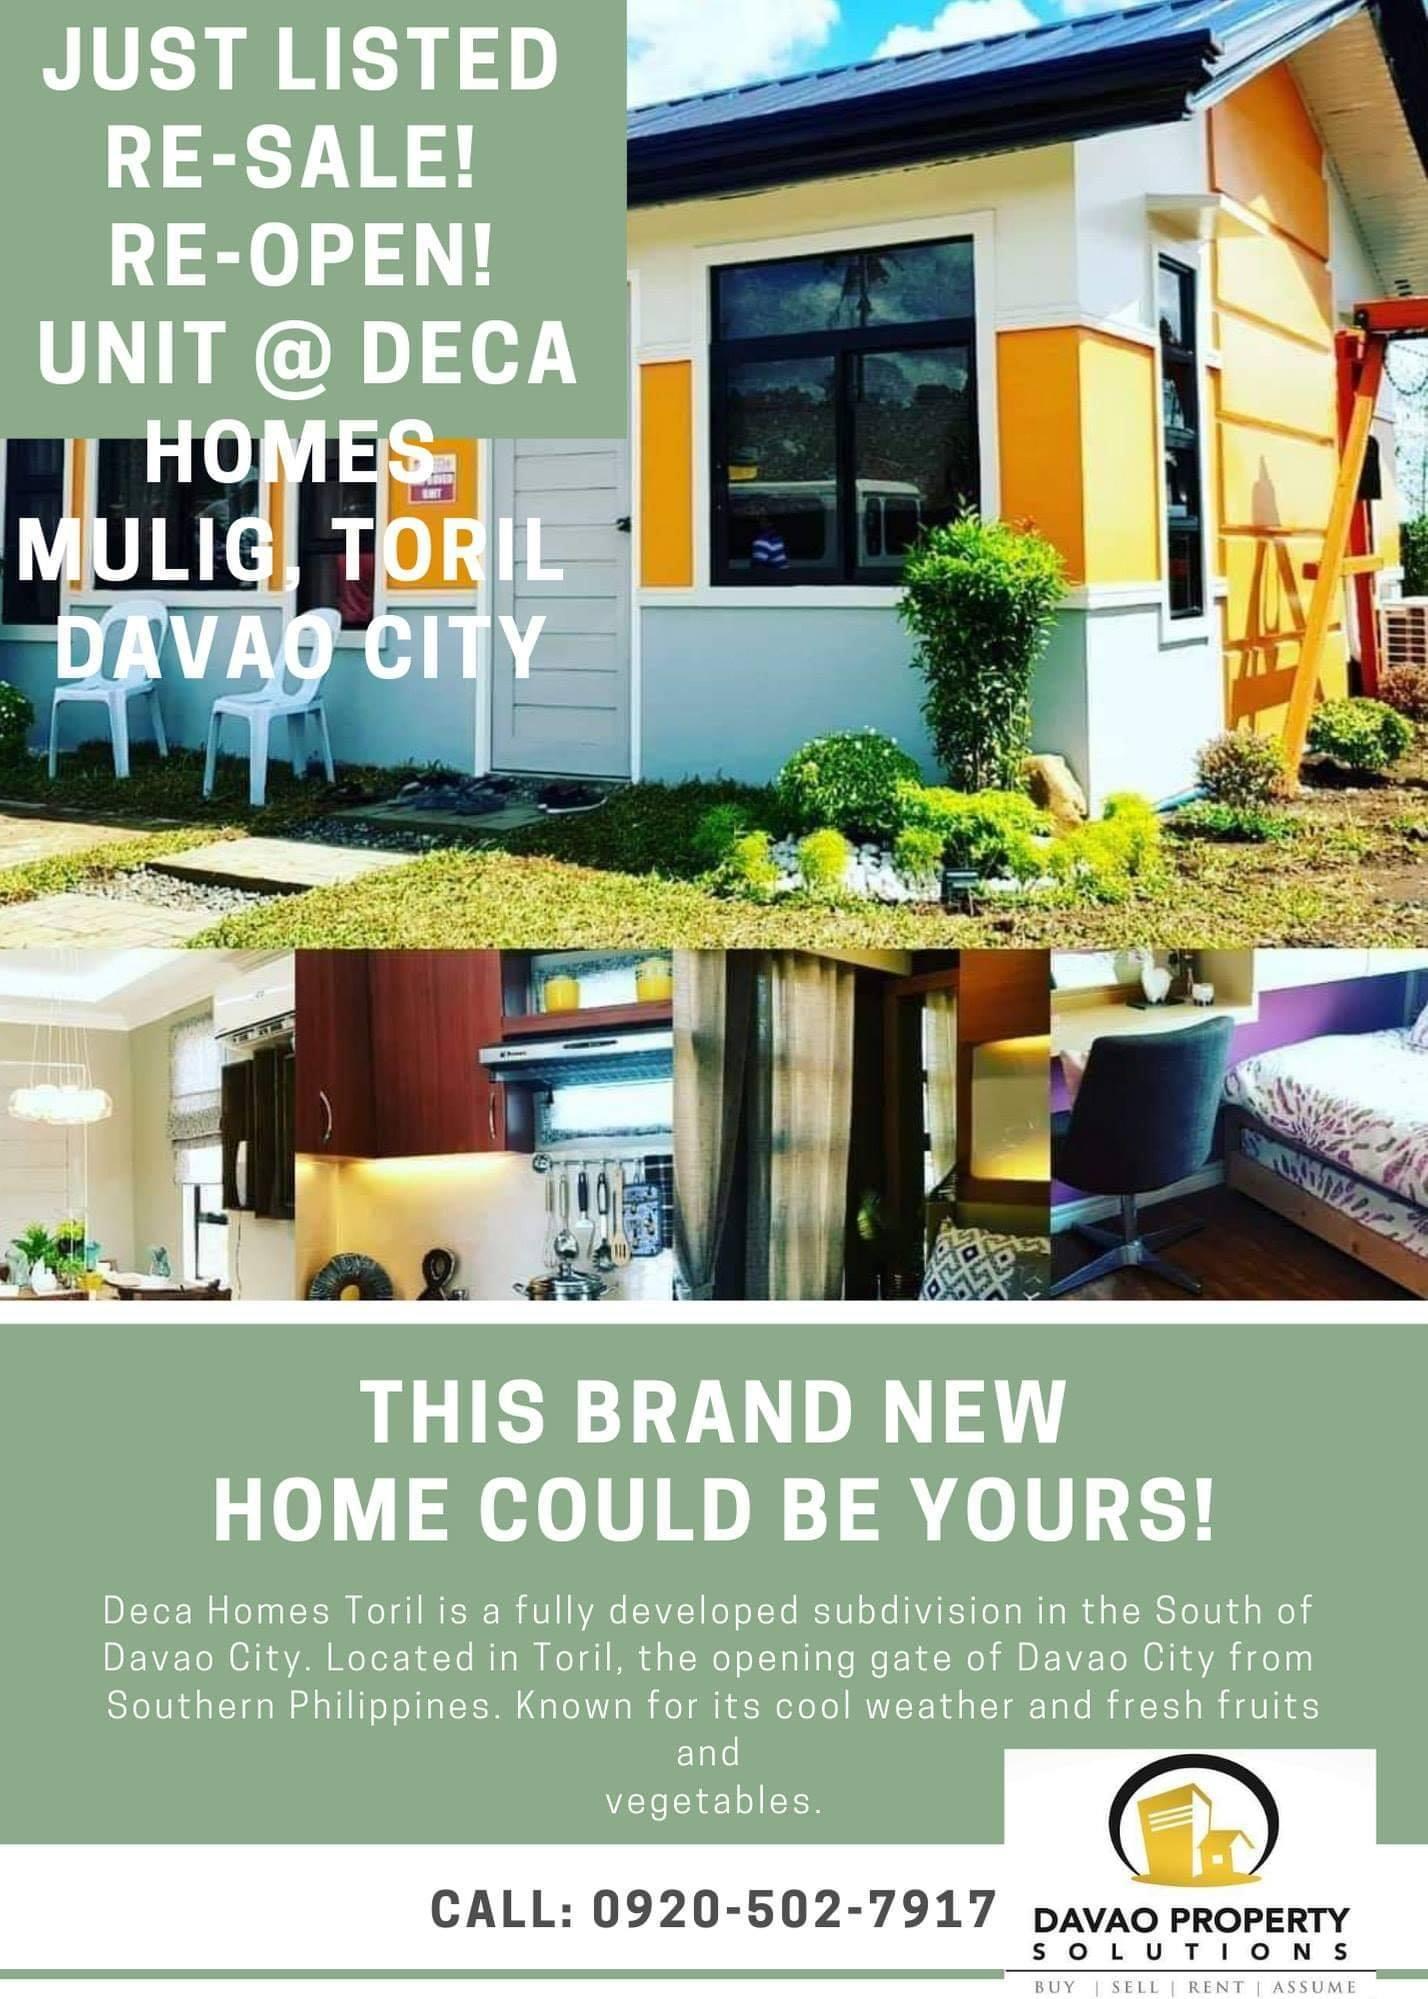 Just ListedRe-Sale, Re-Open, Assumption Promo for Deca Homes...